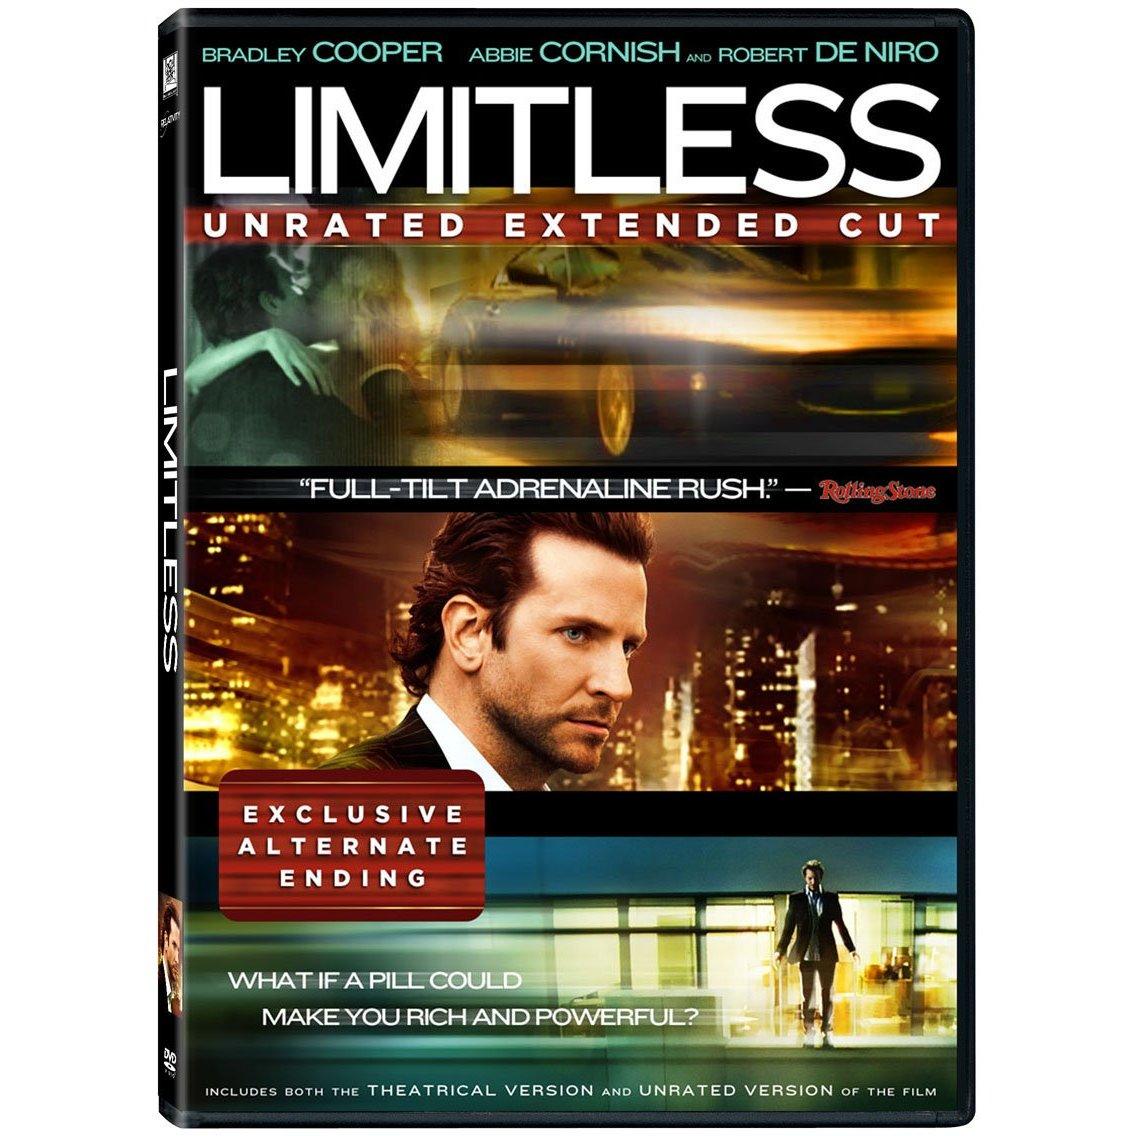 http://2.bp.blogspot.com/-_Onjw--xXtU/TggVfz4iVaI/AAAAAAAAA-w/IXSERQNiaFo/s1600/Limitless+DVD.jpg